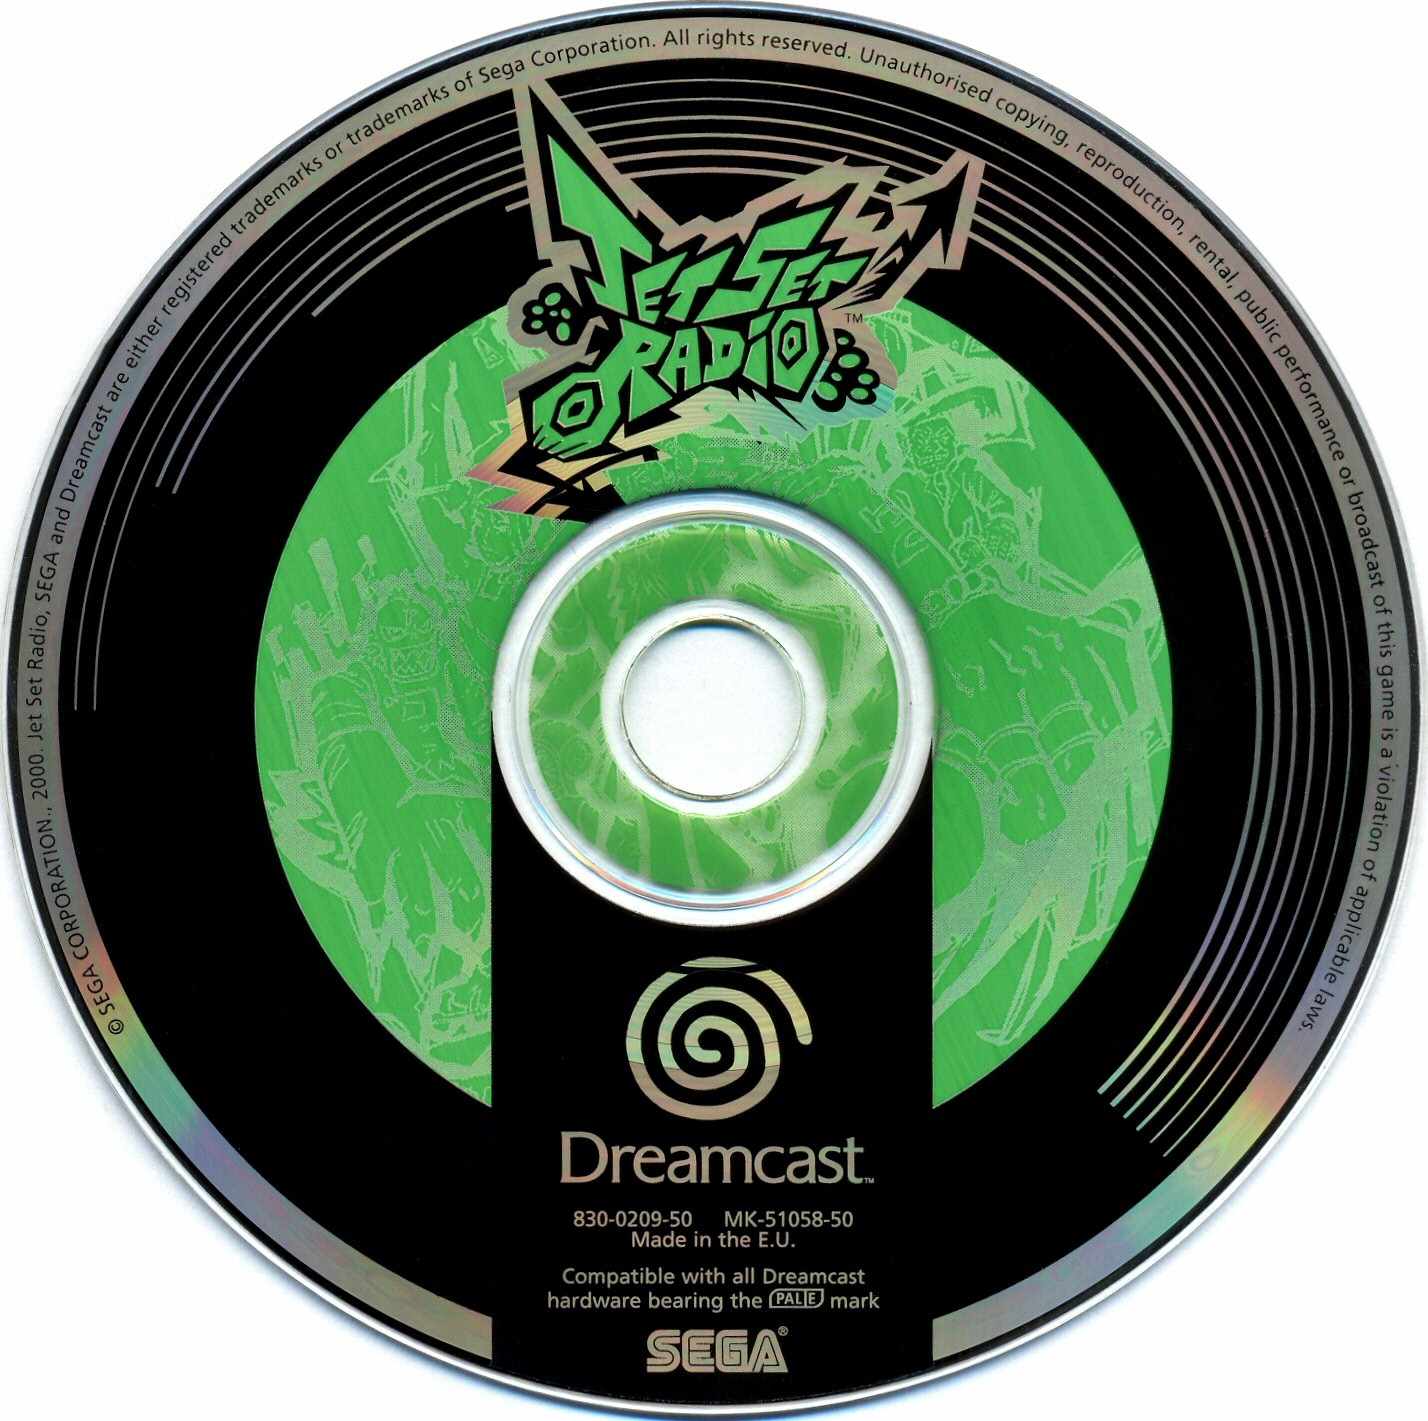 Jet-Set-Radio-PAL-DC-cd.jpg